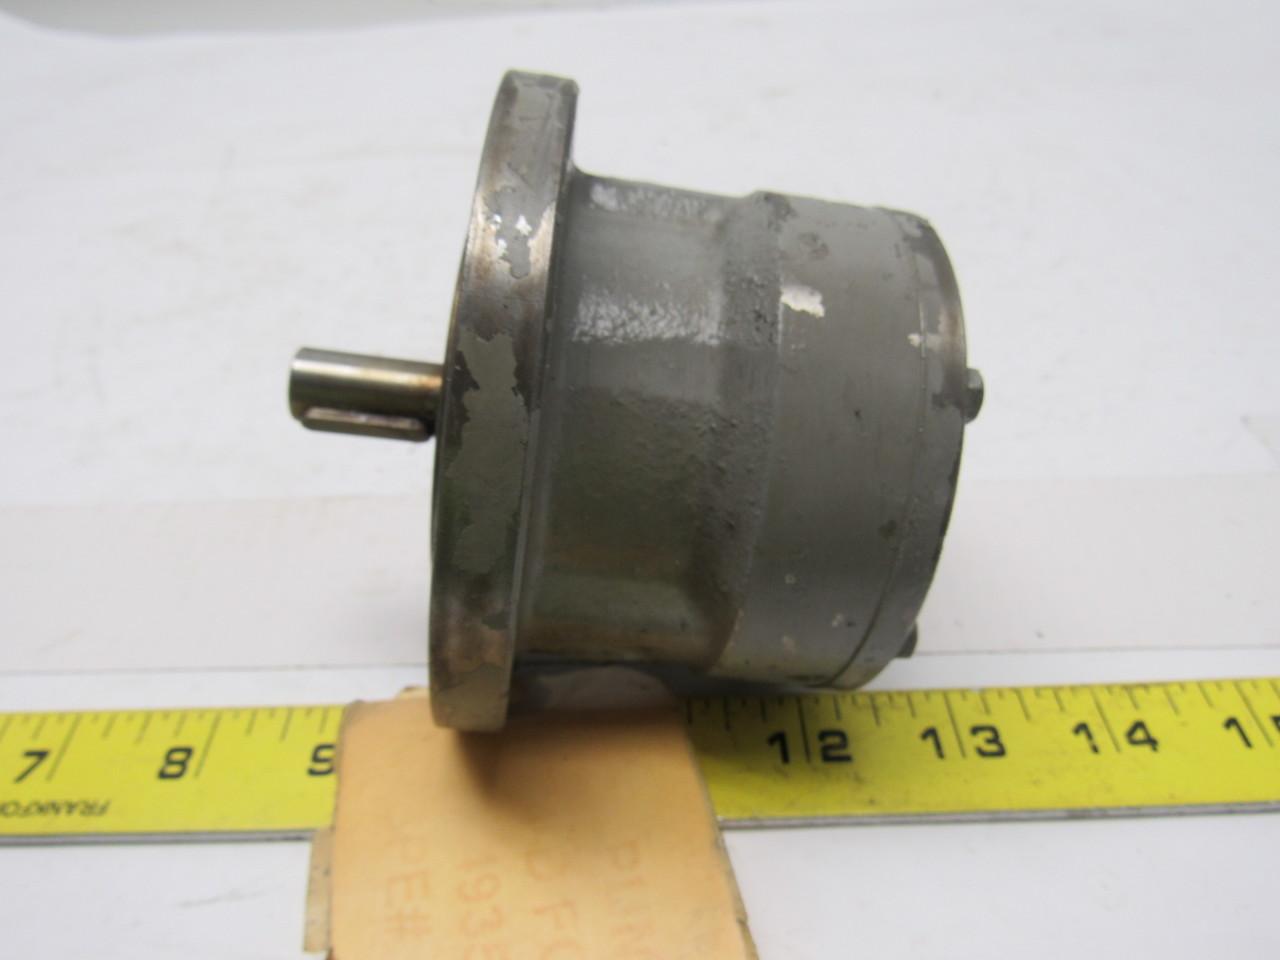 Stoz Sugo Size 0 Flange Mount Hydraulic Pump W/12mm Shaft